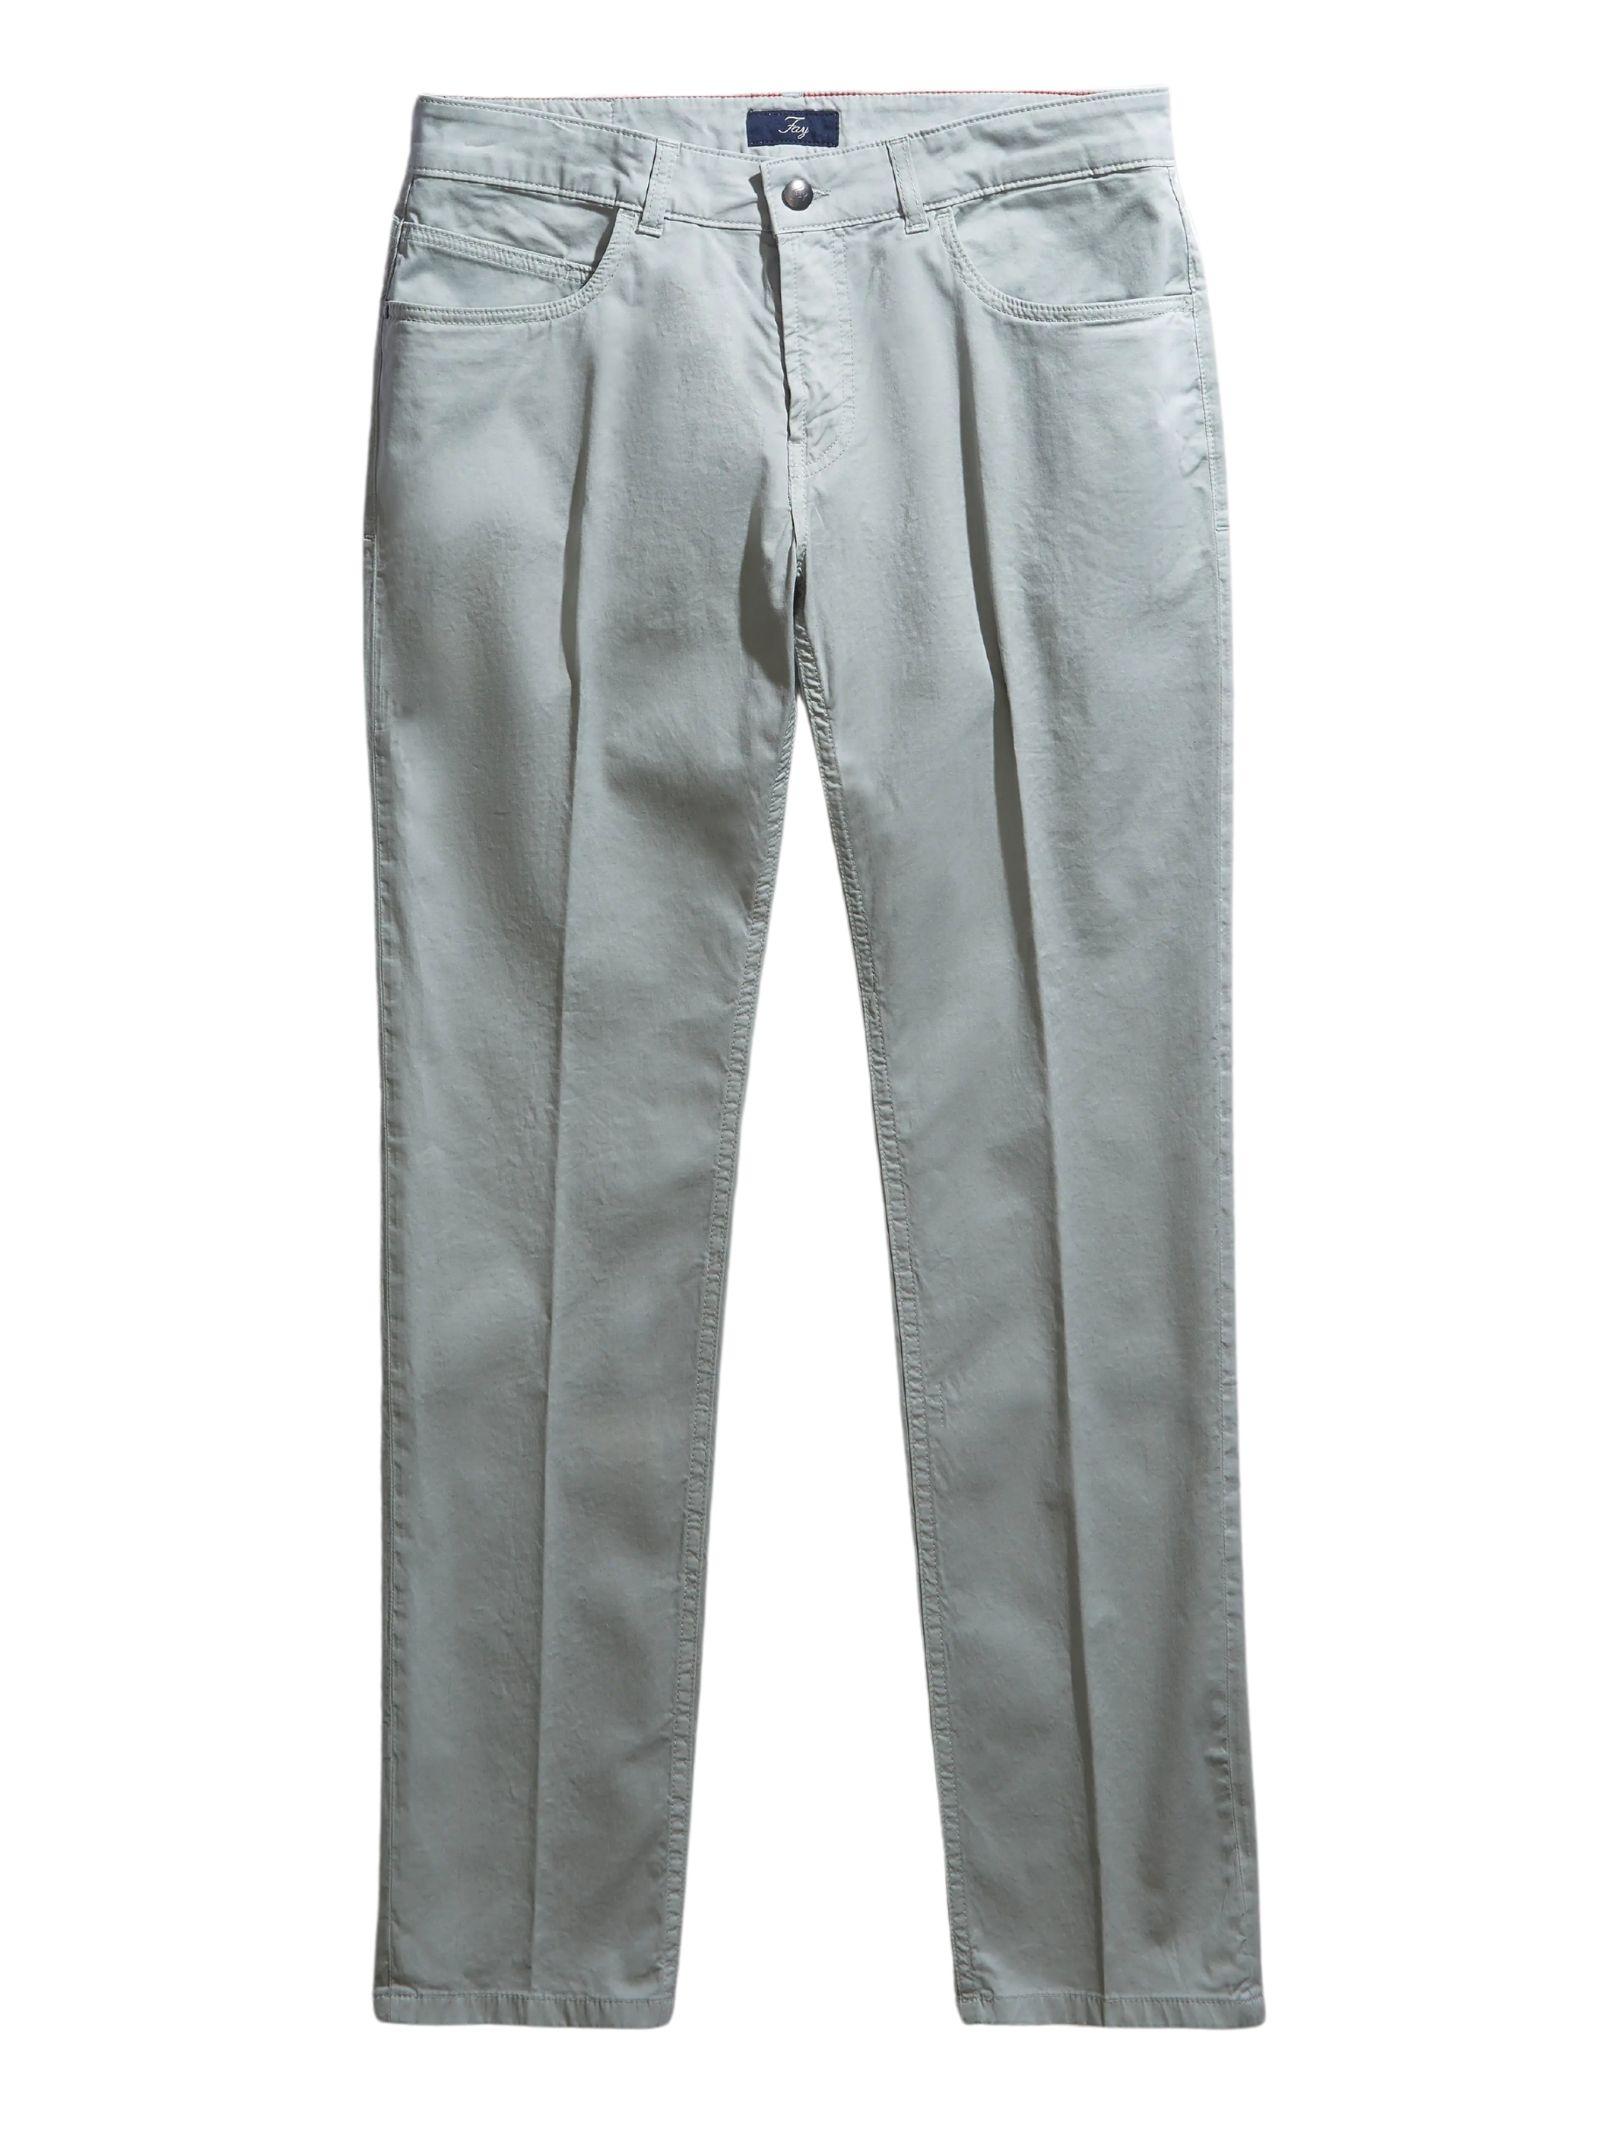 Pantalone 5 Tasche Argento FAY | Pantalone | NTM8242180TGURB200